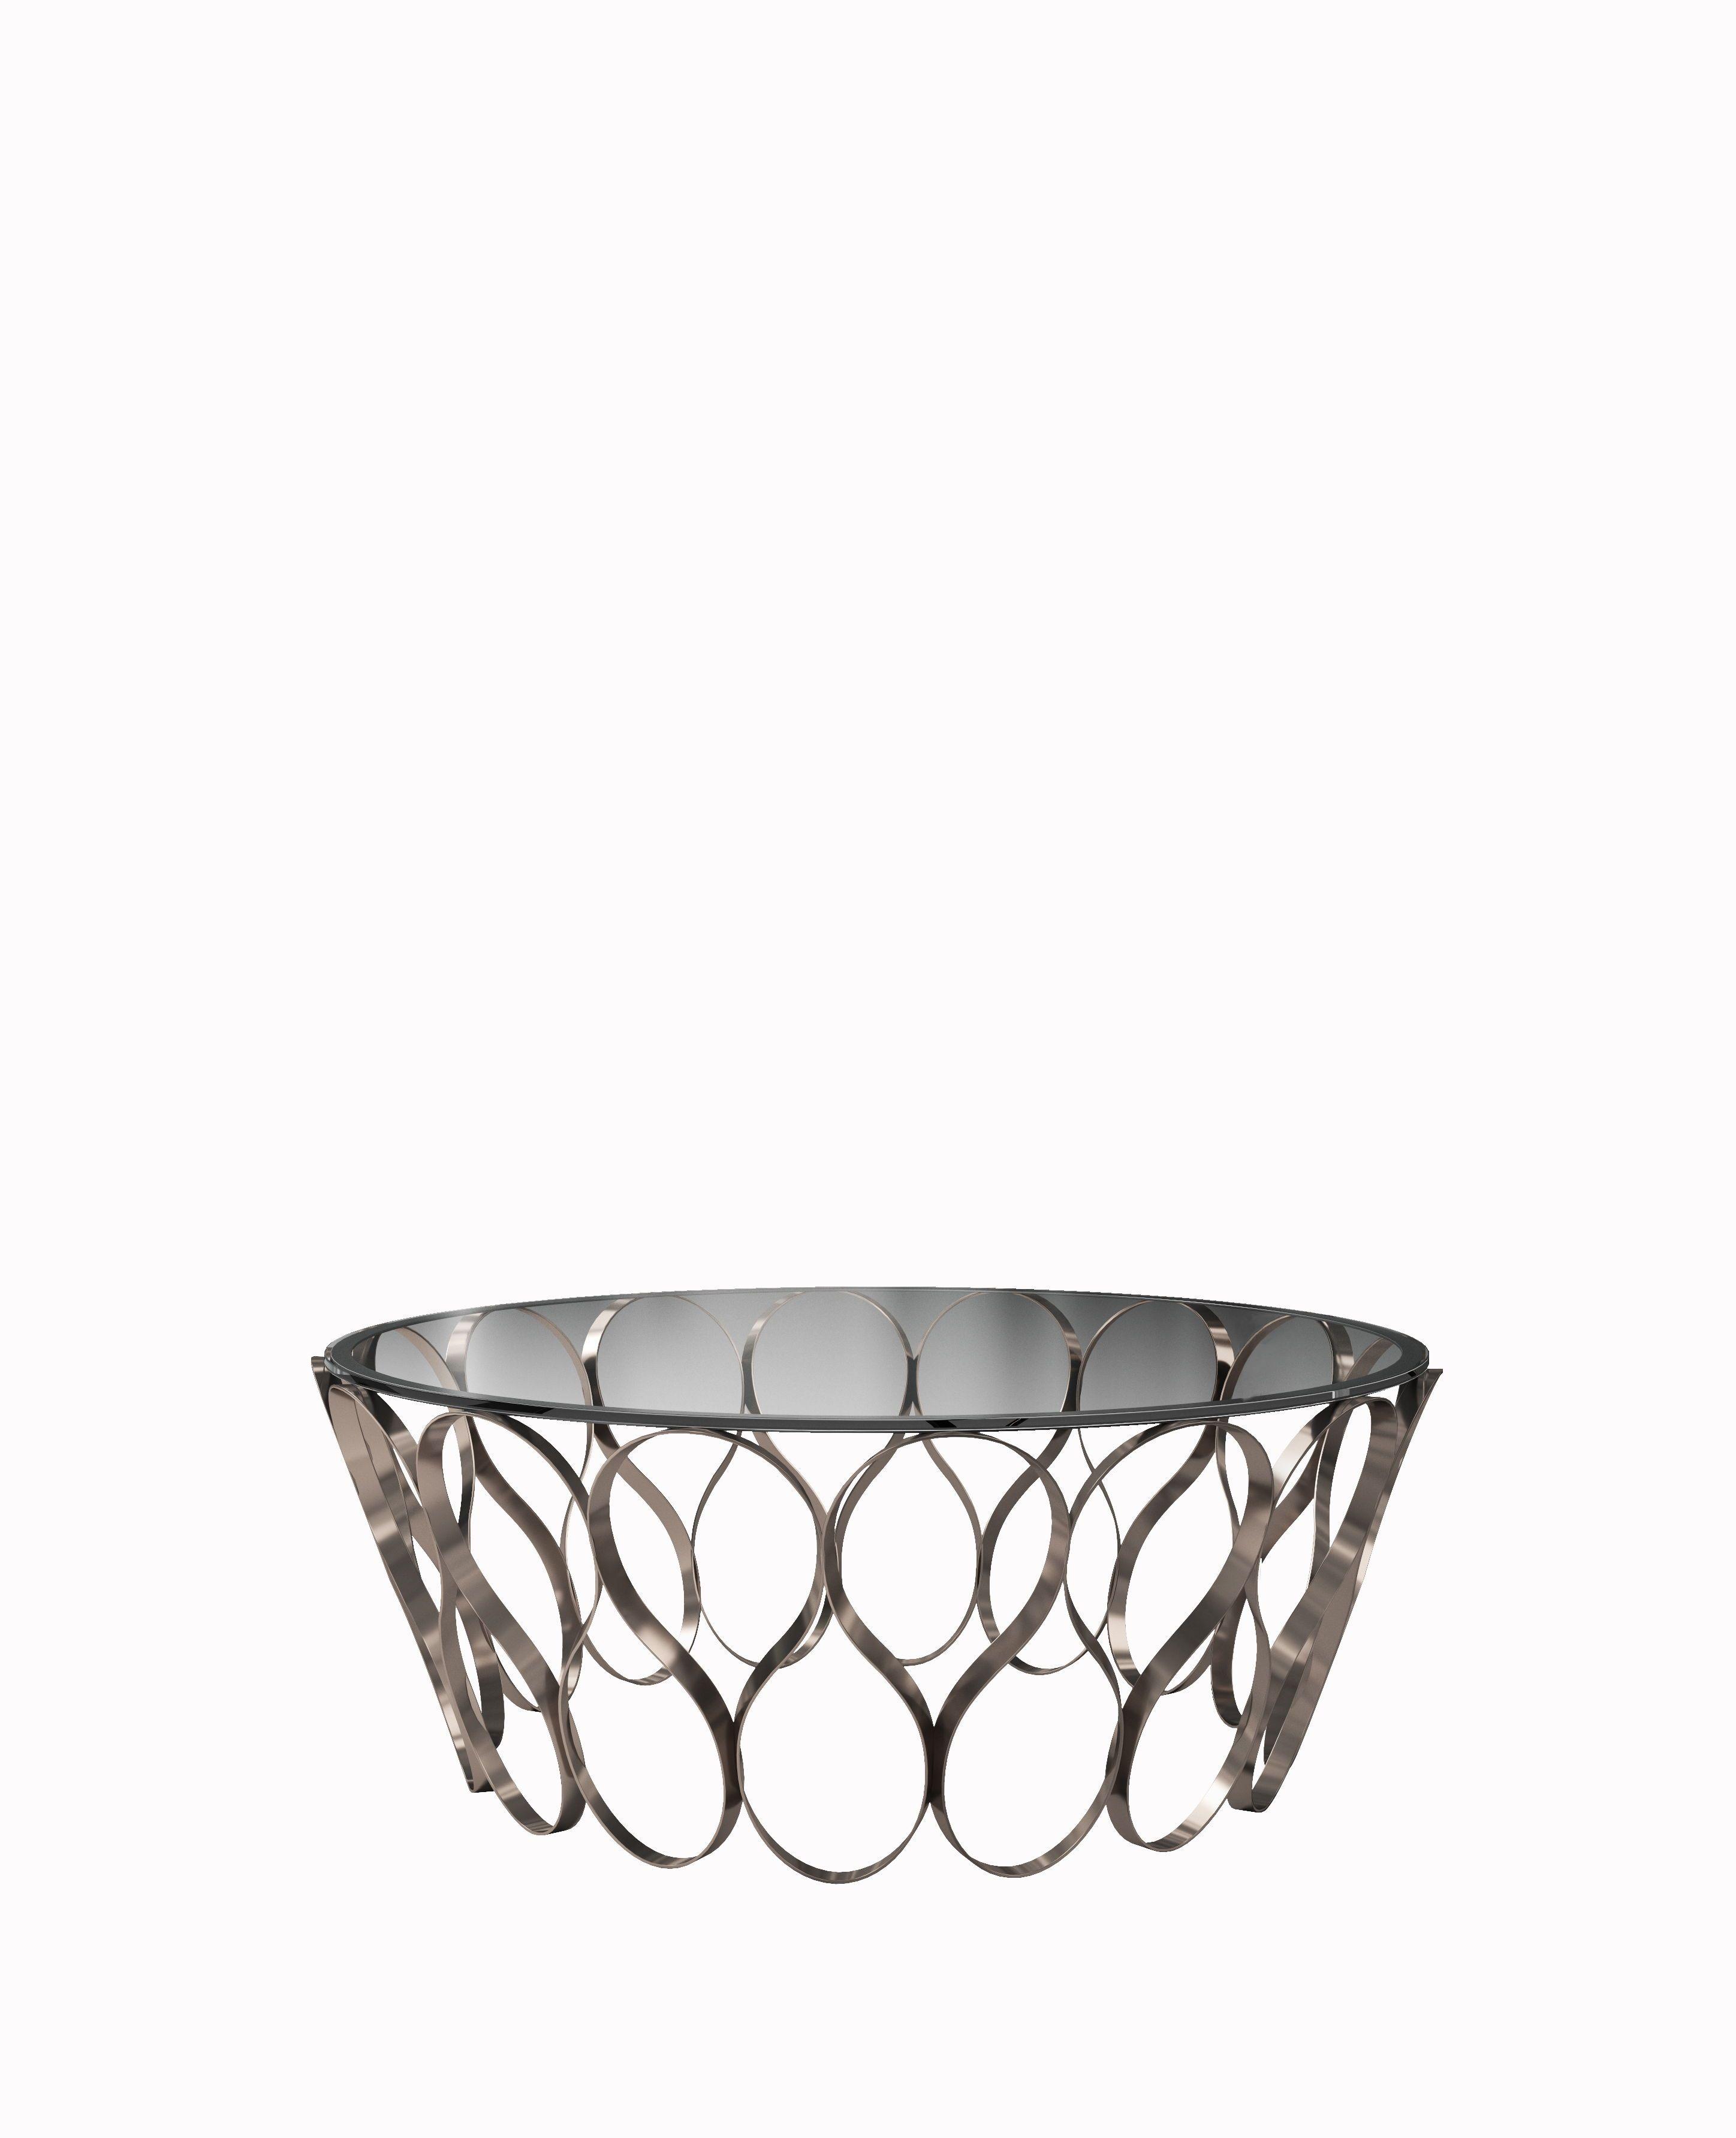 2019 modern style tea table black regular metal base glass rh pinterest es